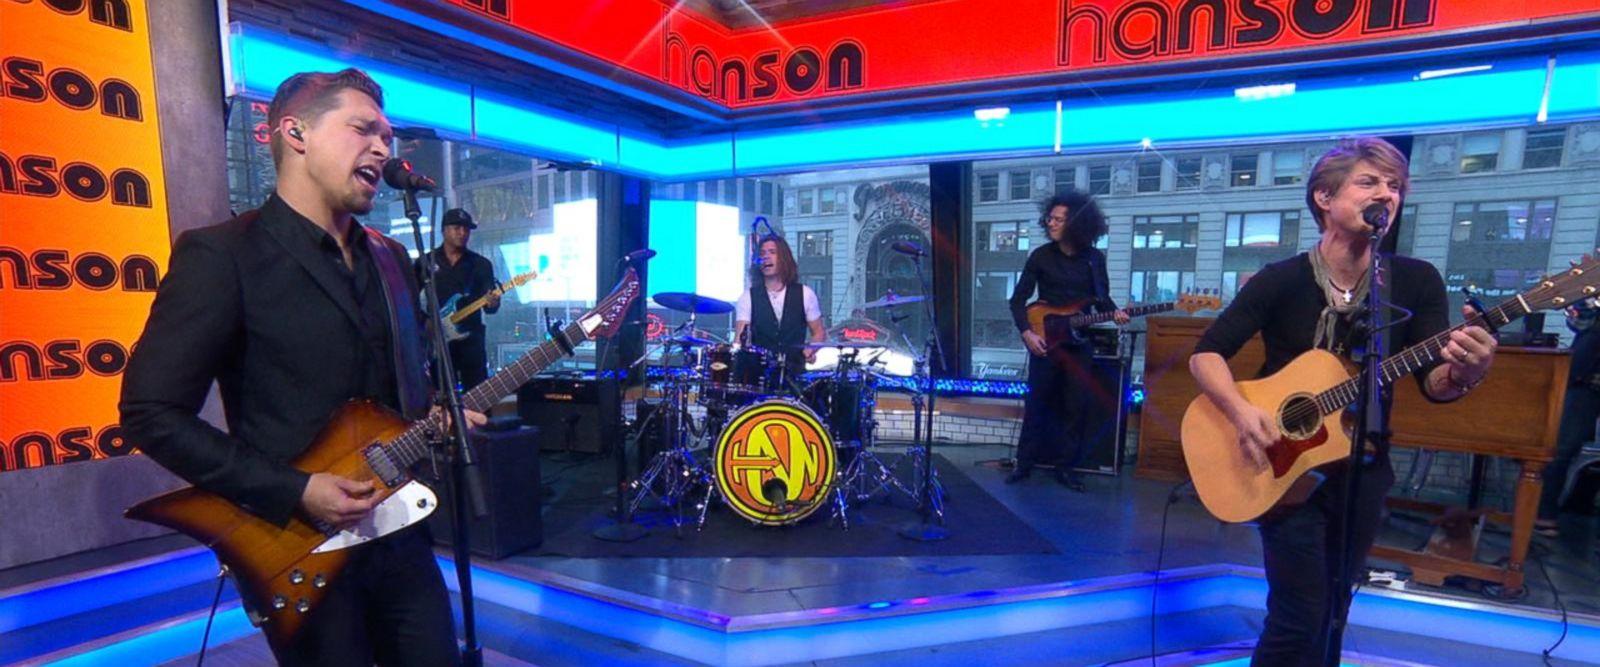 VIDEO: Hanson performs 'I Was Born' on 'GMA'